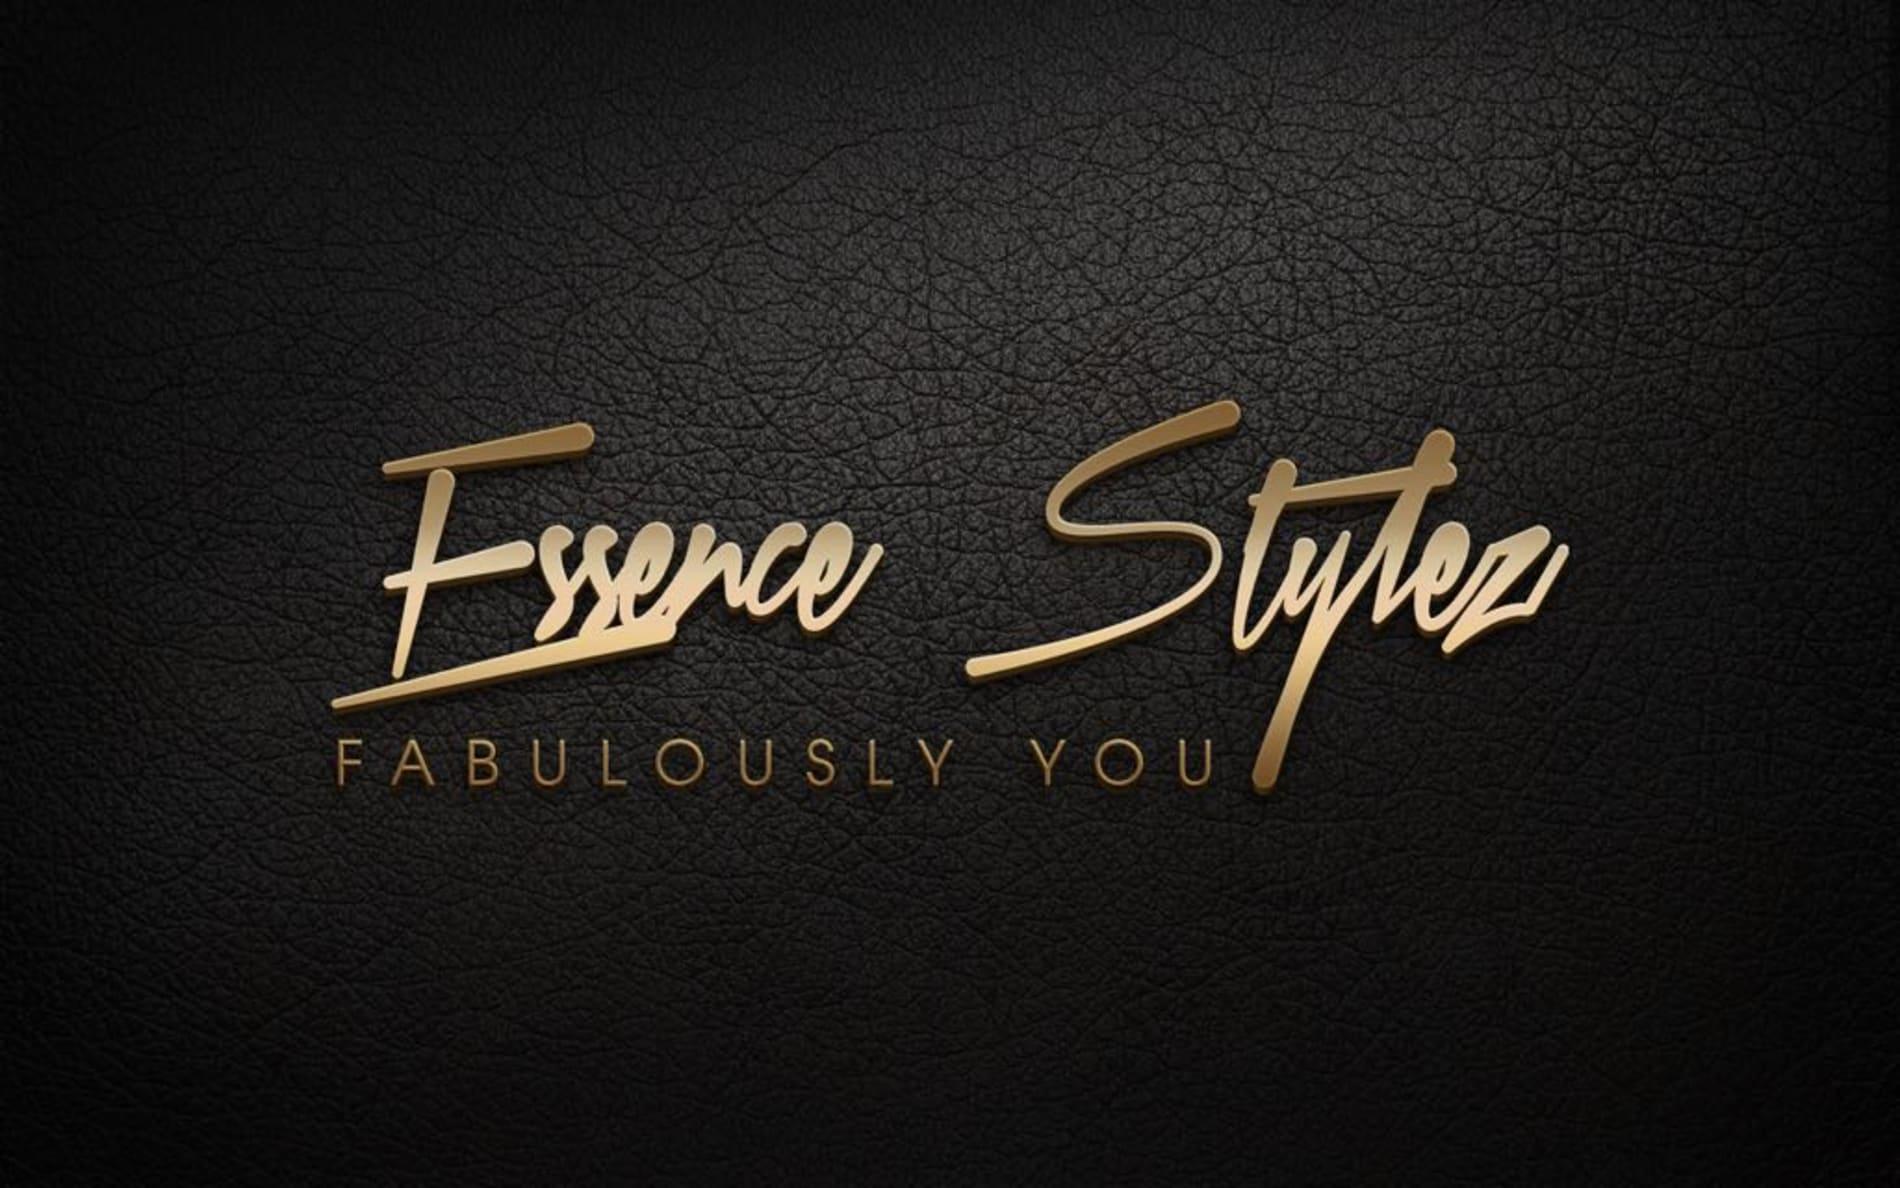 Essence Stylez